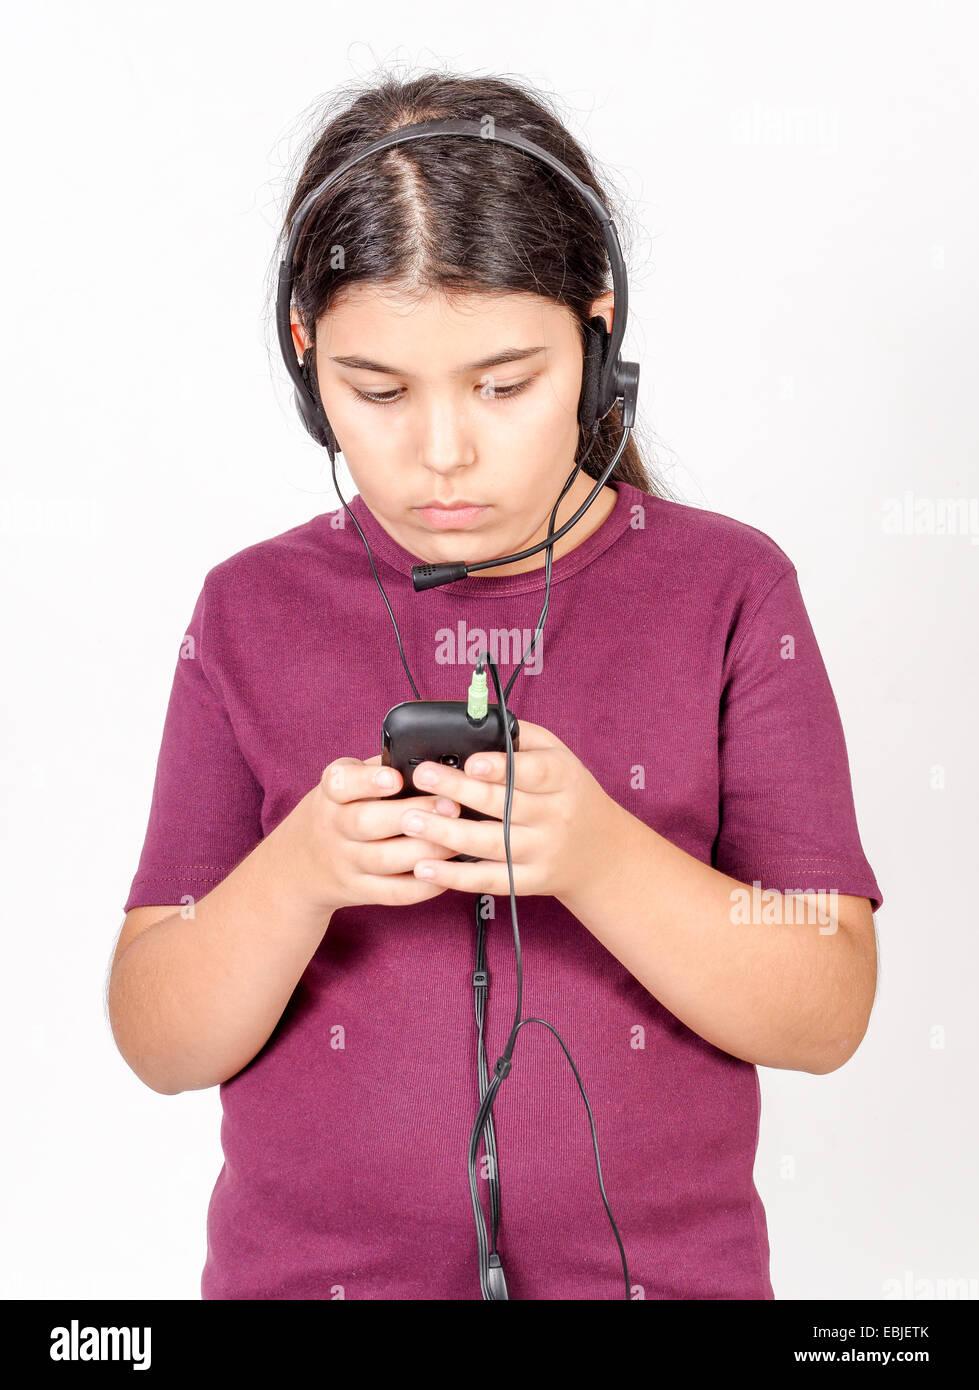 Girl of 9 listens to music on headphones - Stock Image